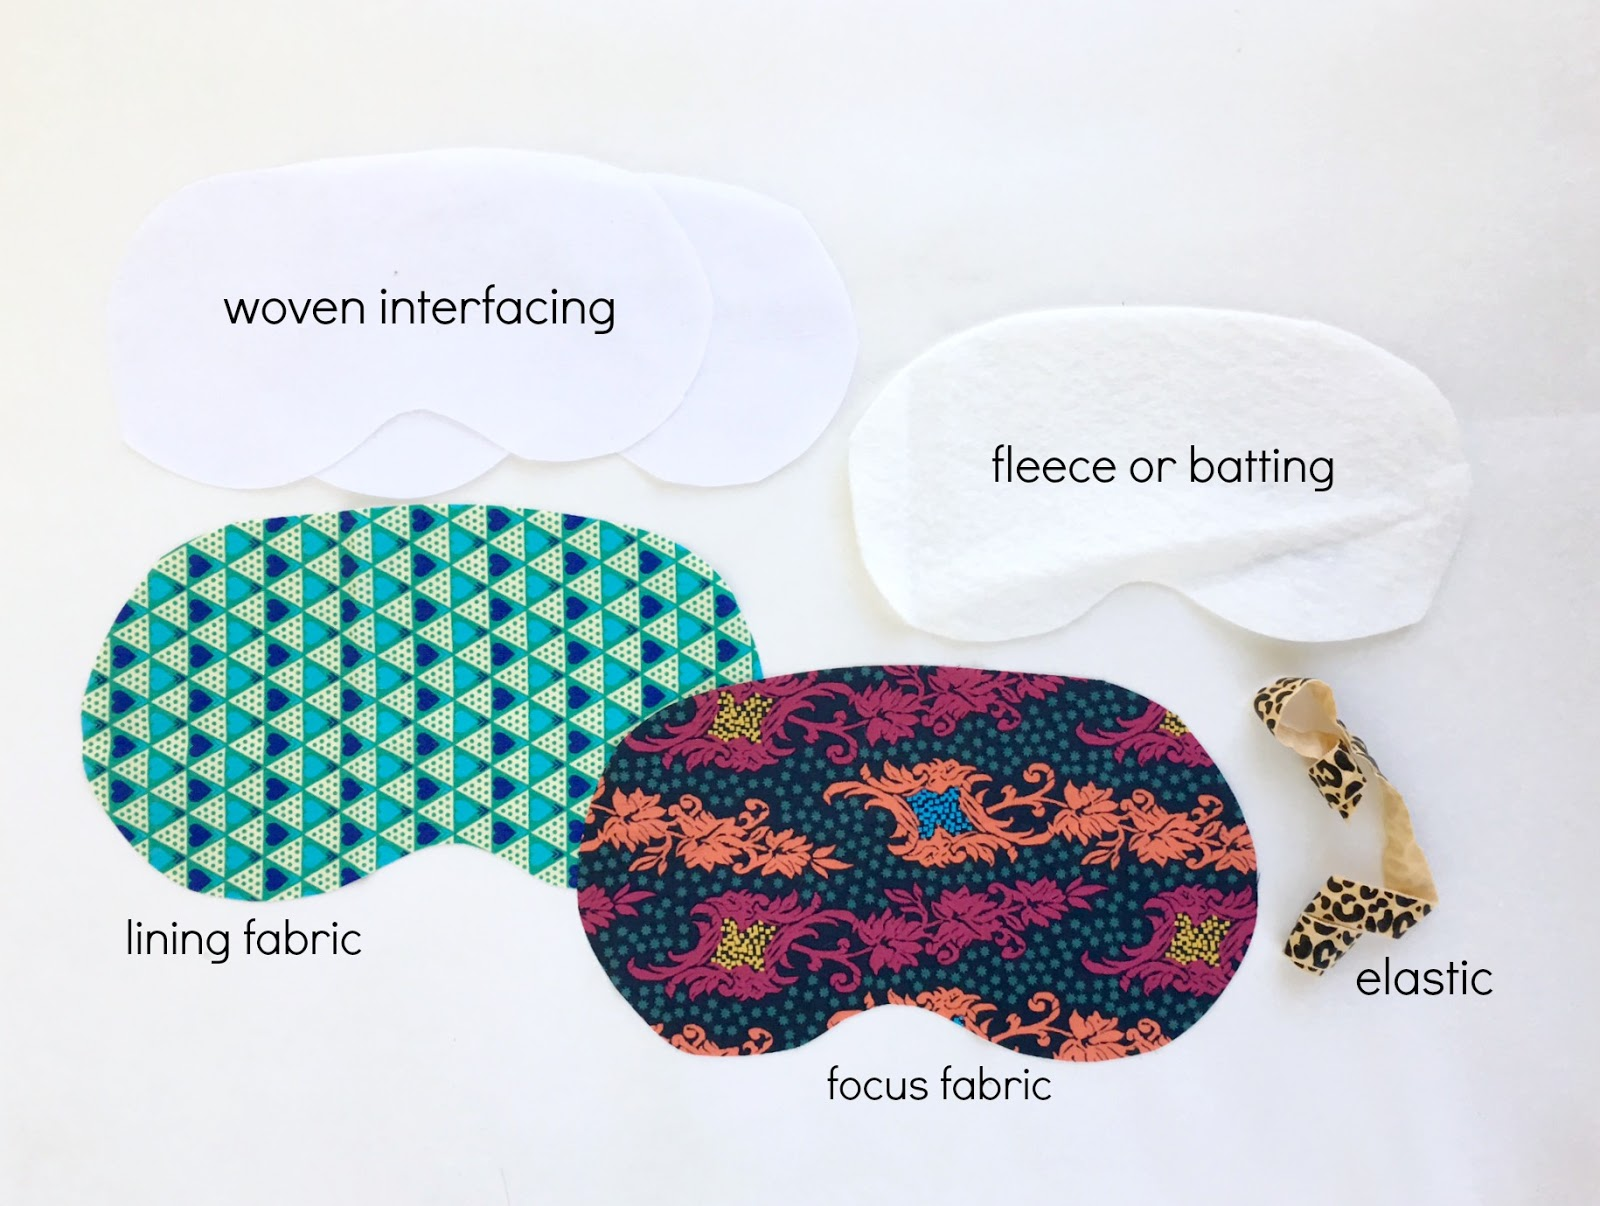 sewhungryhippie: How to sew a sleep mask